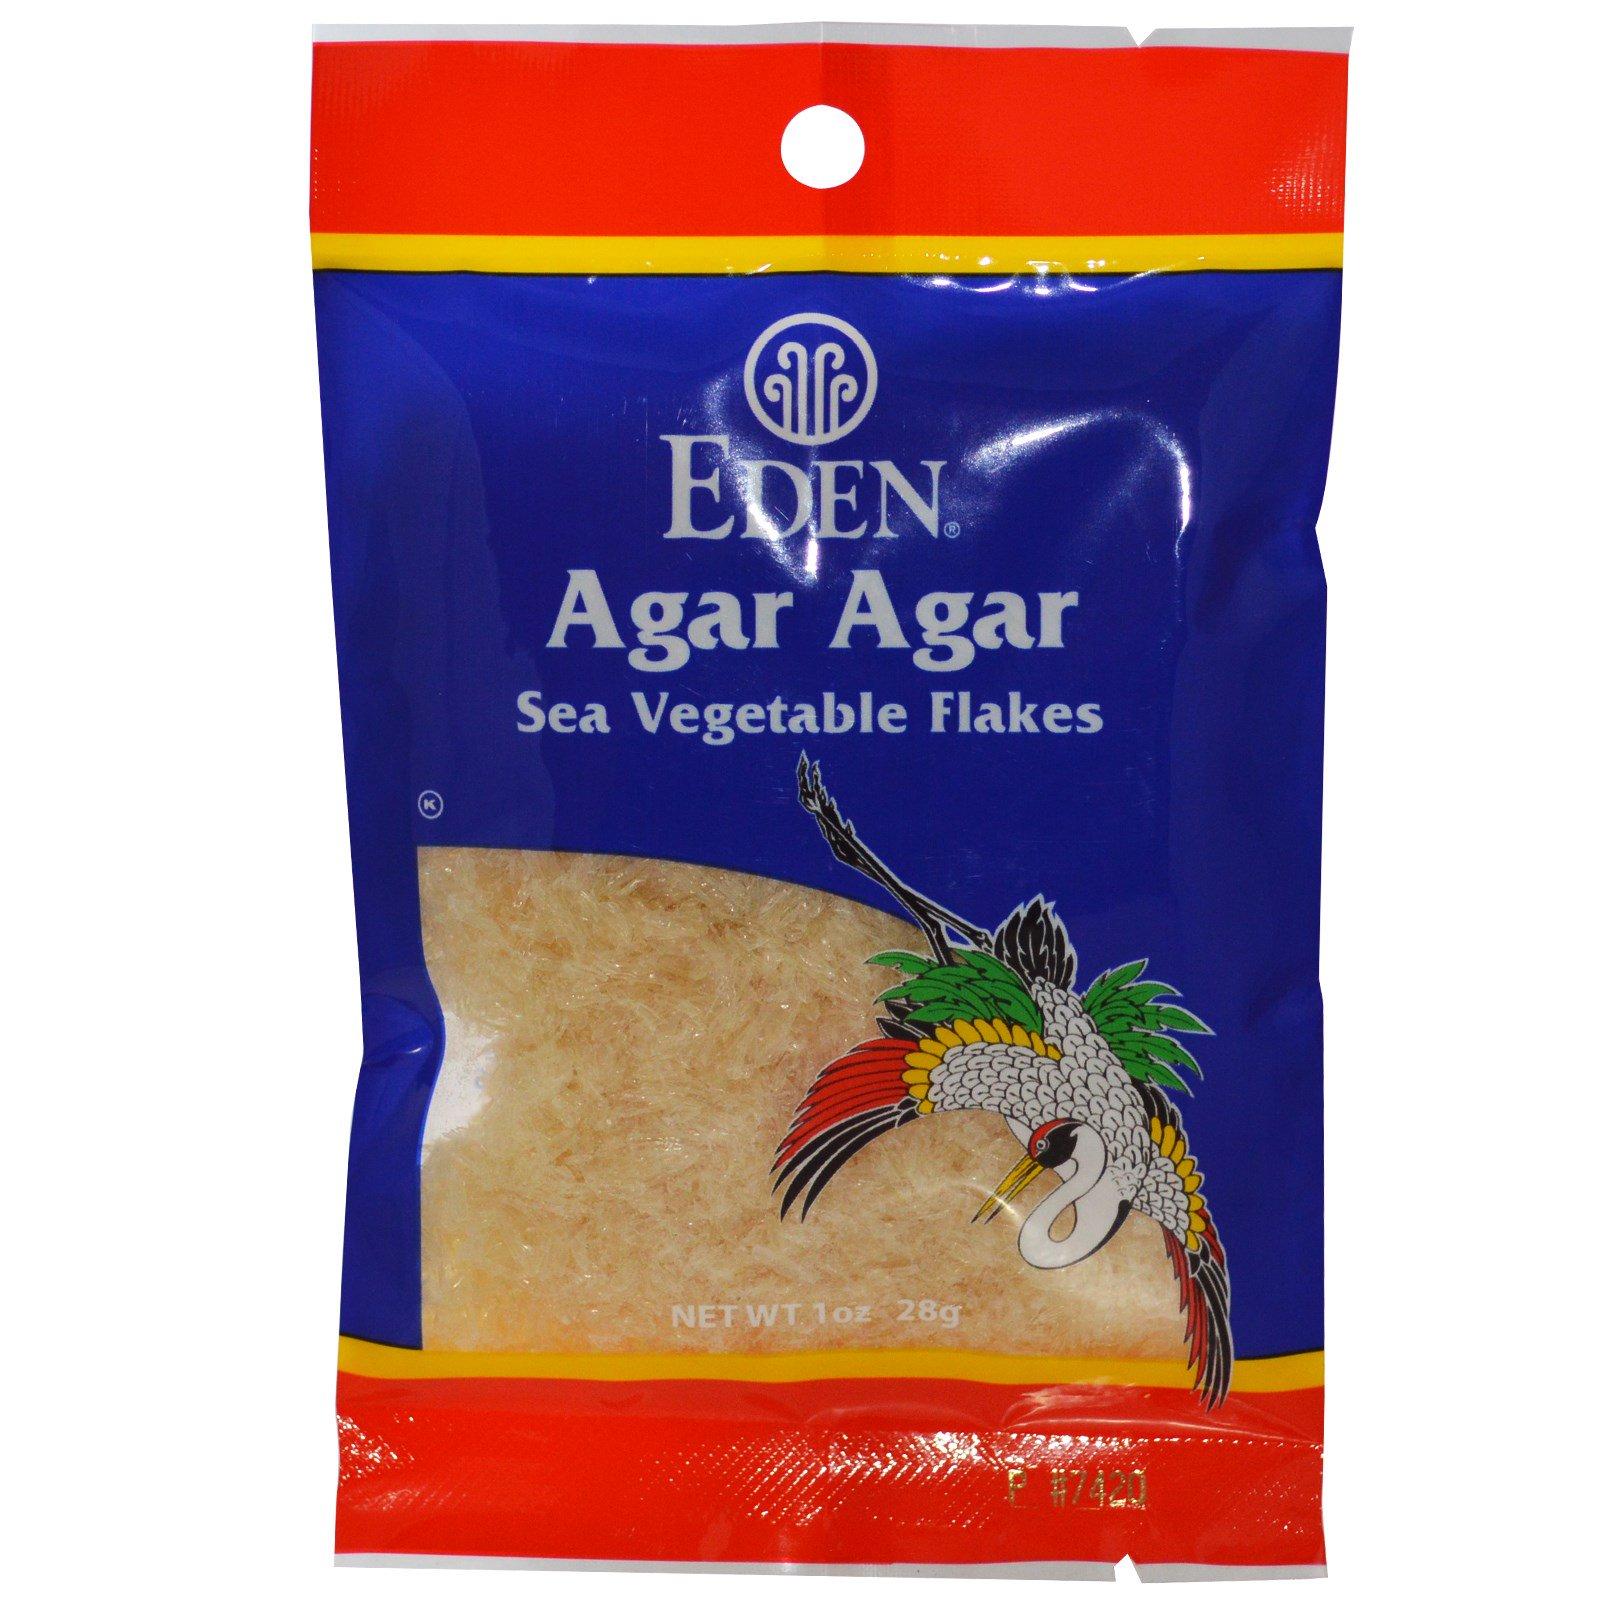 Eden Foods, Agar Agar, Sea Vegetables Flakes, 1 oz (28 g